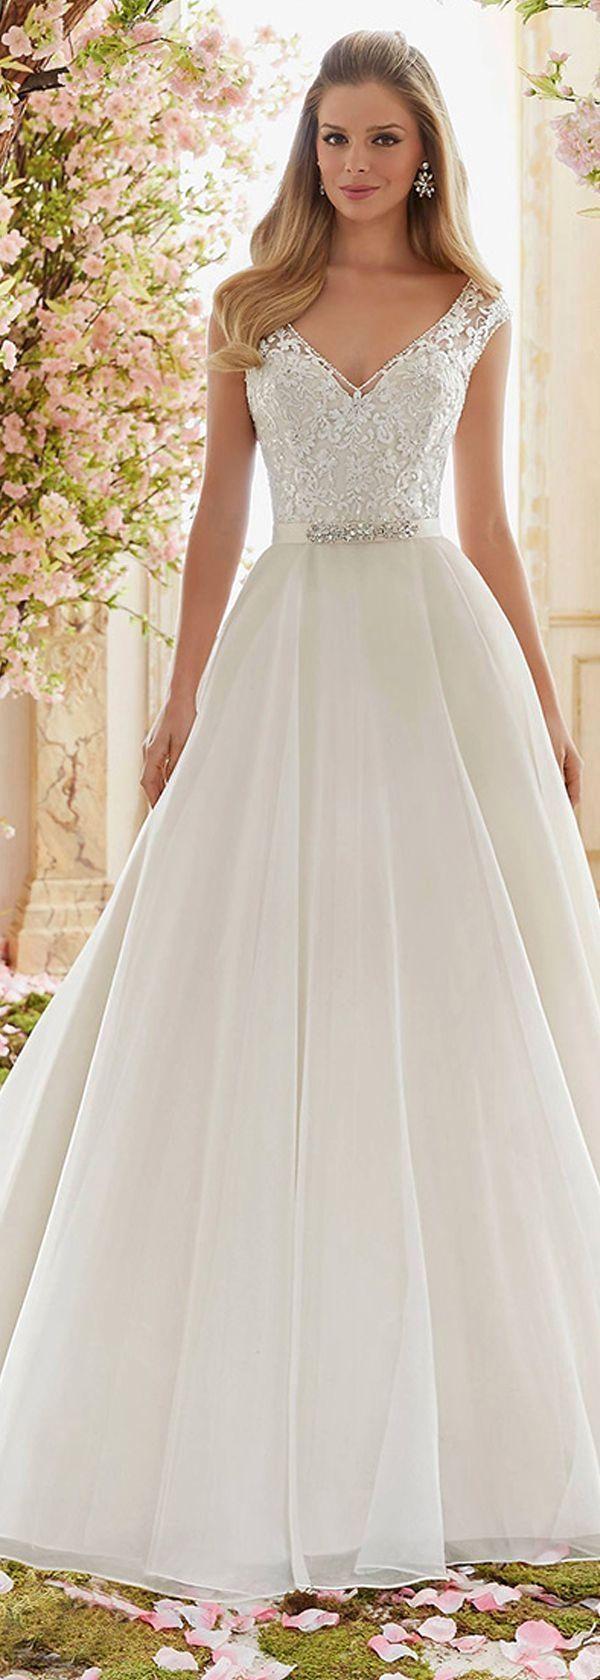 Wedding-Dresses-1247